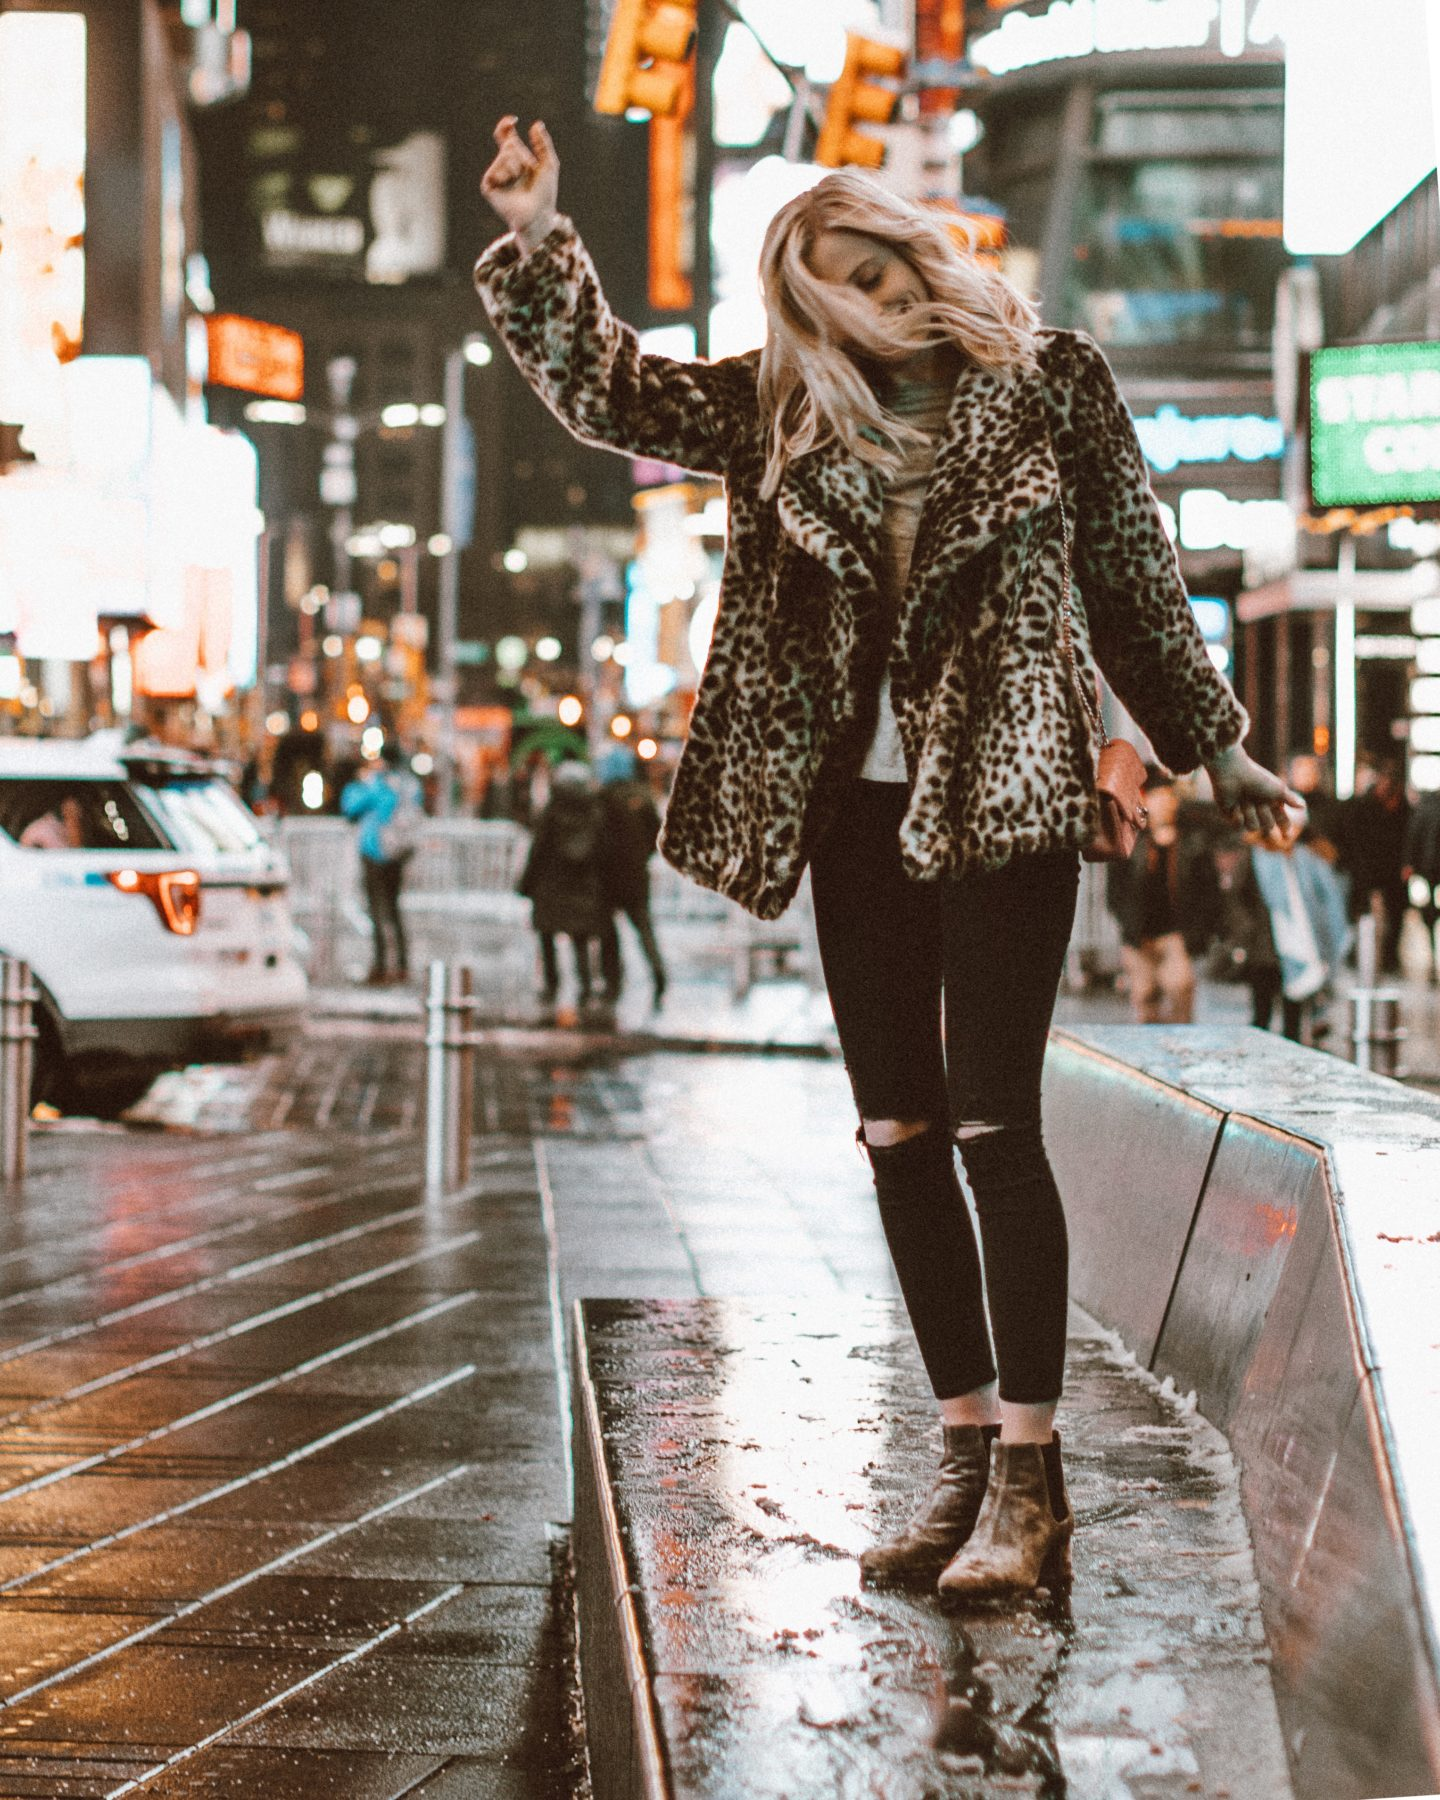 Leopard Faux Fur Coat in Times Square